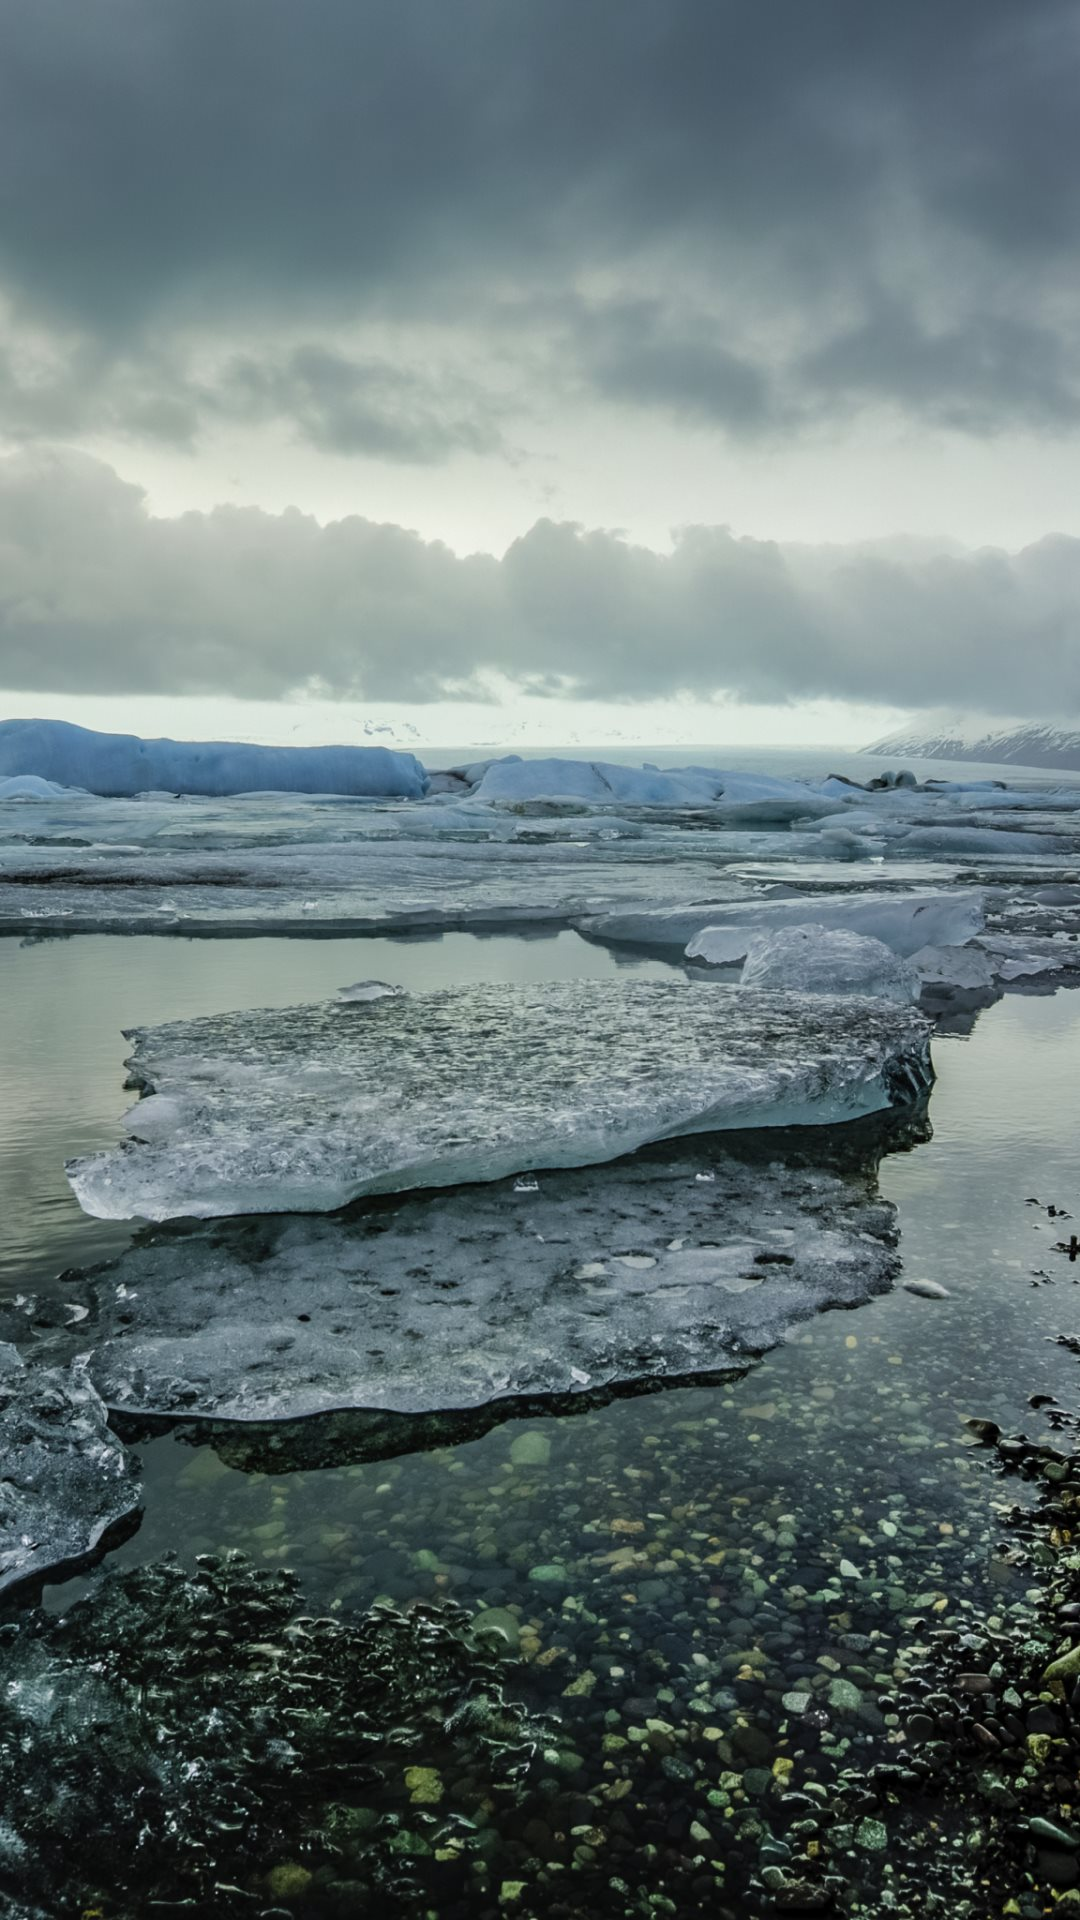 iceland 4k wallpaper - photo #27